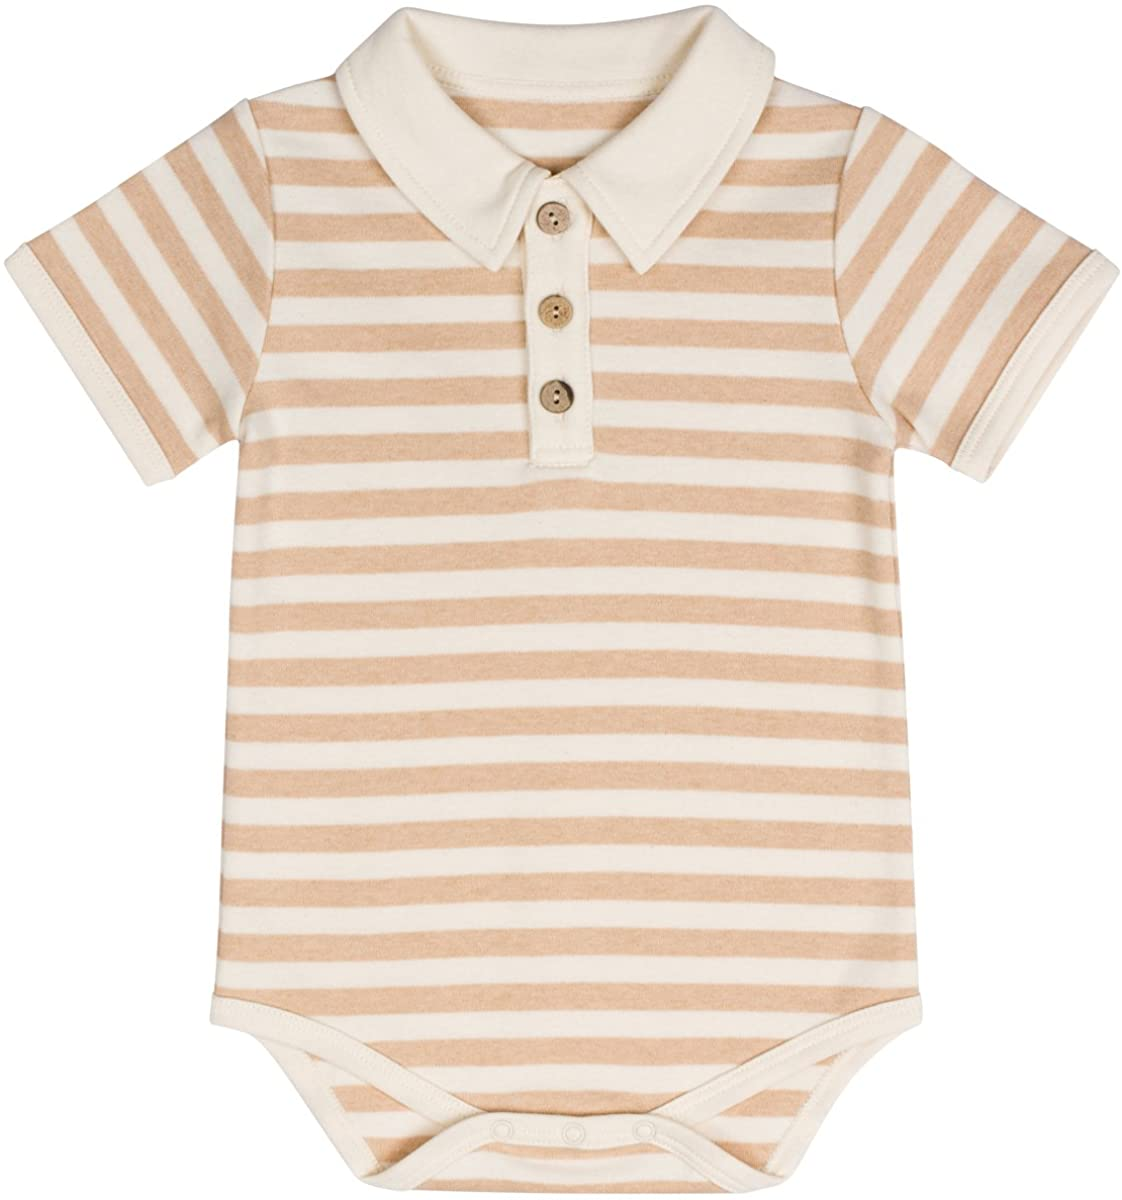 Niteo Baby Organic Cotton Polo Onesie Bodysuit Short Sleeve: Natural, Dye-Free